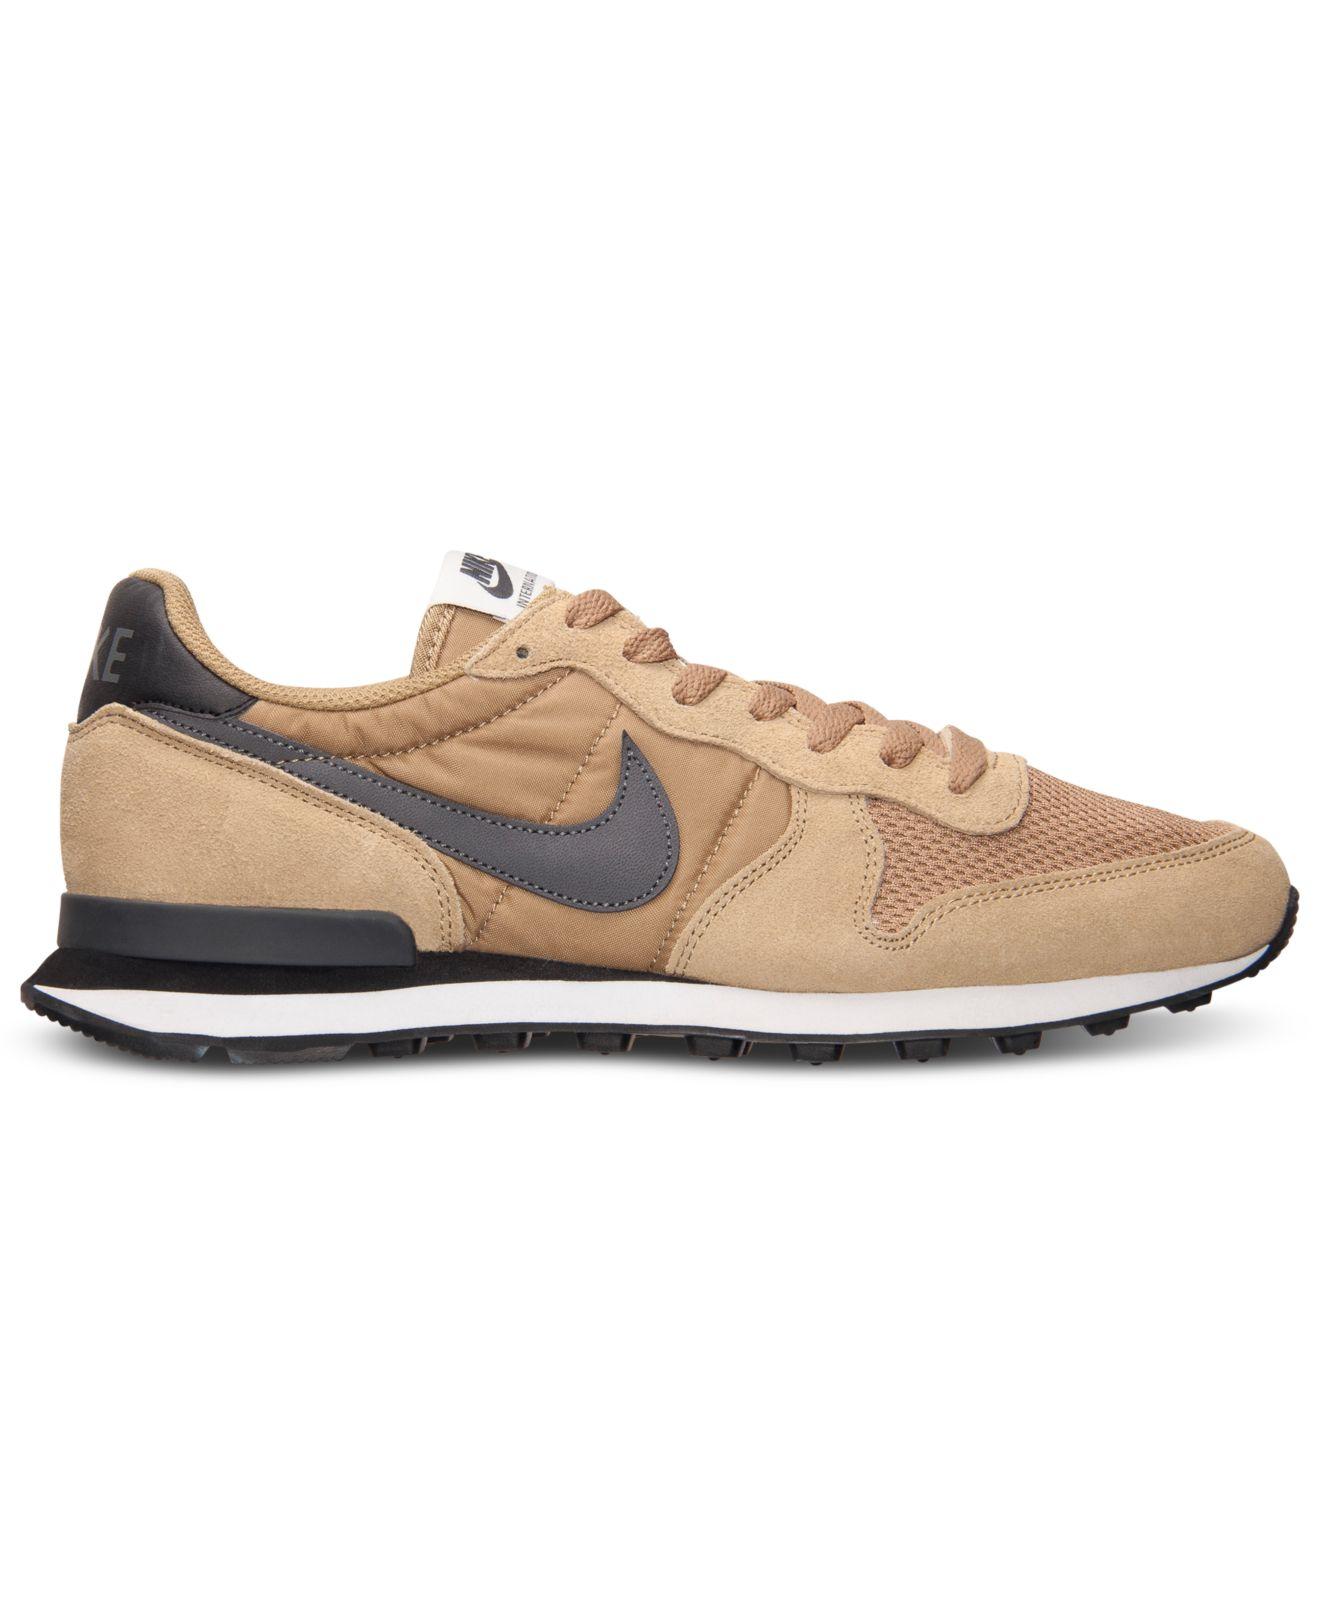 newest 7b981 e3ba9 Previously sold at Macys · Mens Nike Internationalist ...